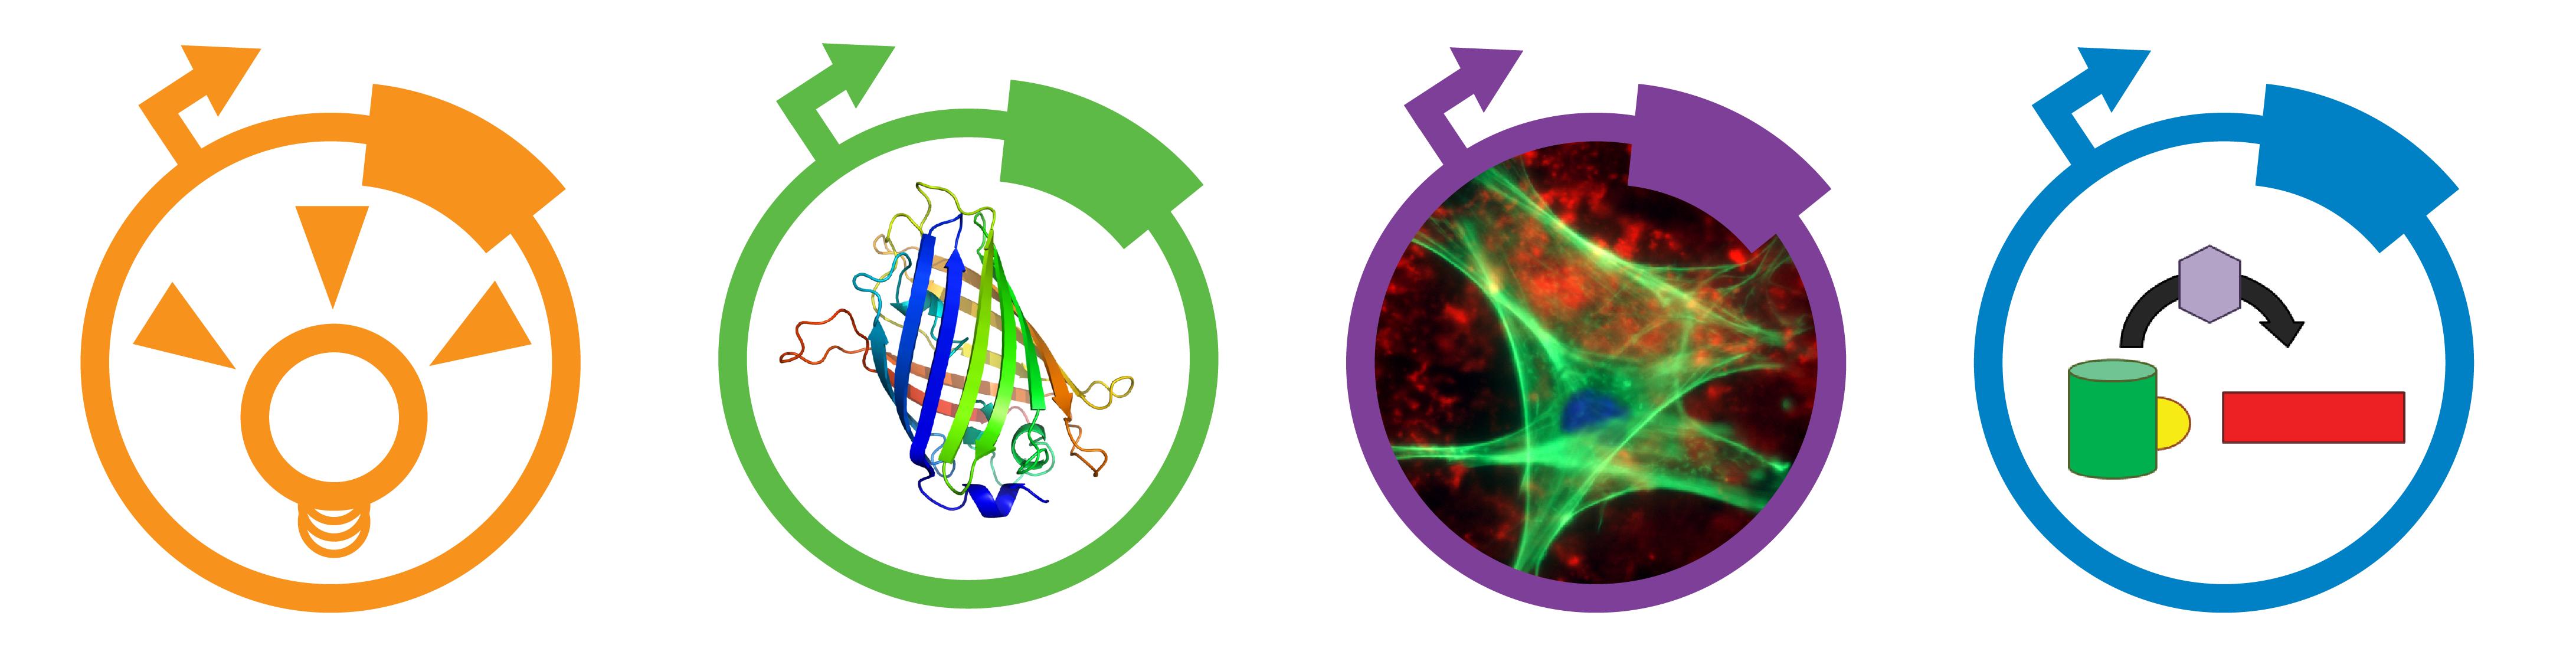 fluorescentProtein eBook Image-01.png